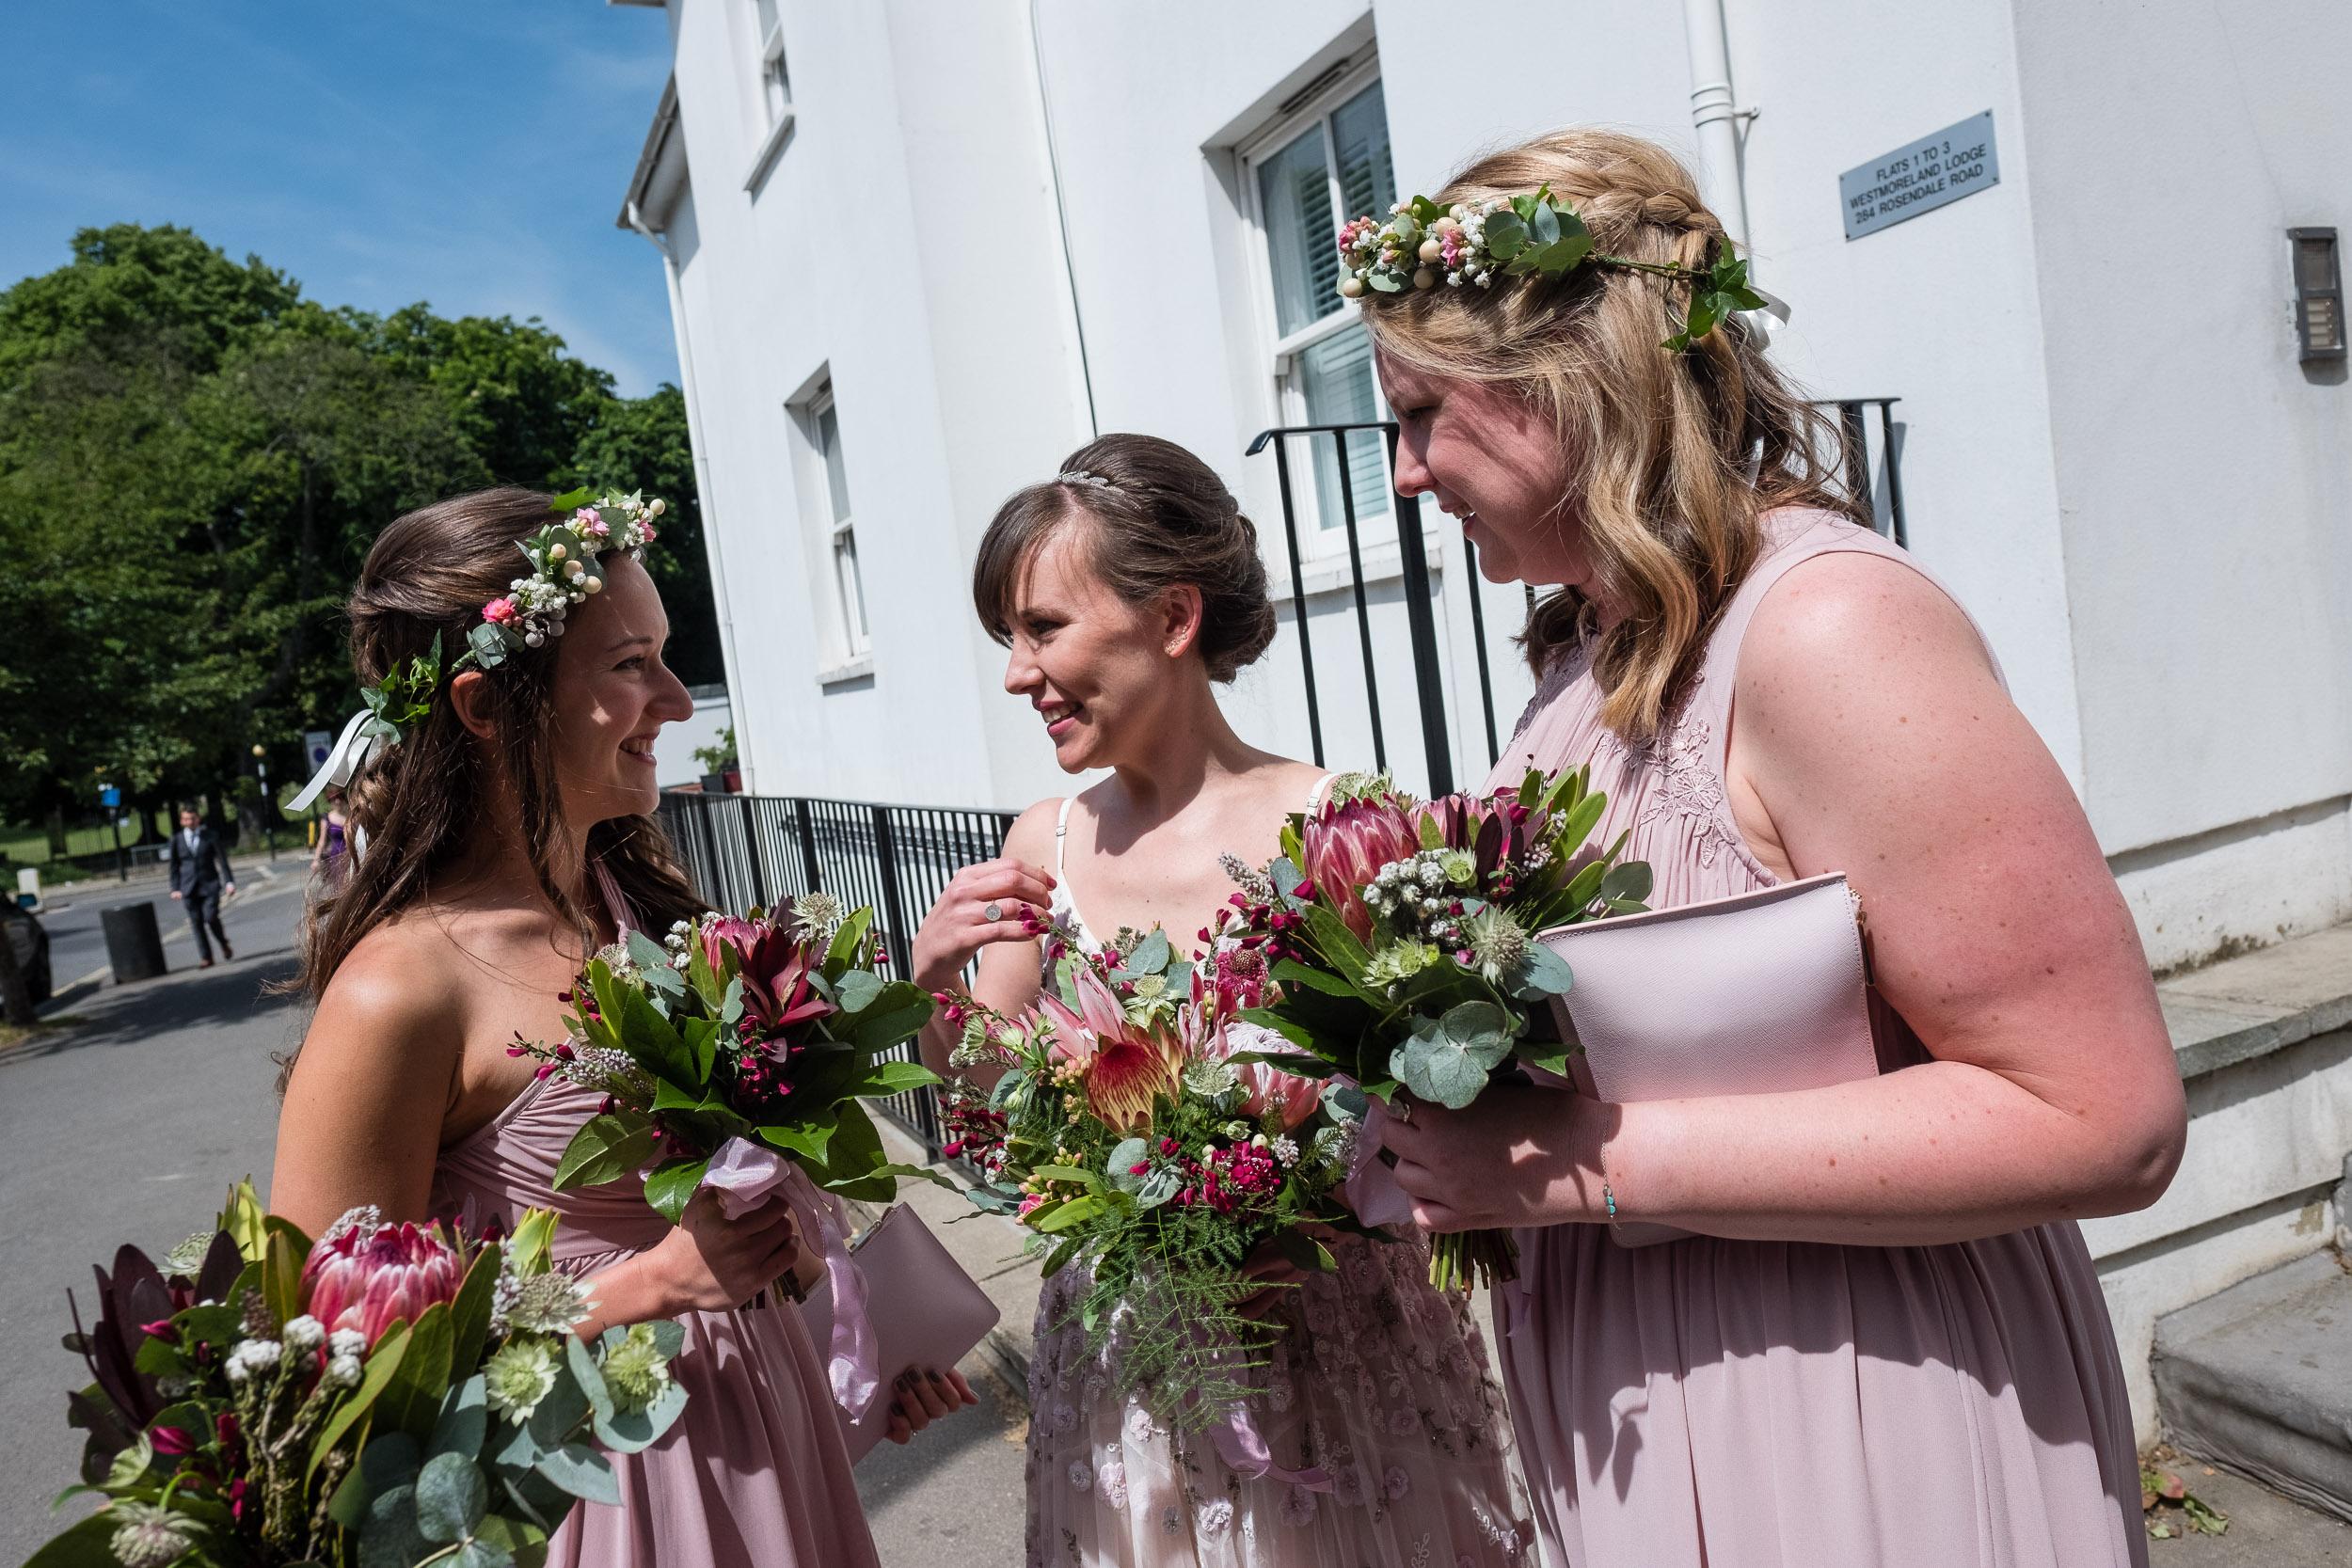 brockwell-lido-brixton-herne-hill-wedding-034.jpg